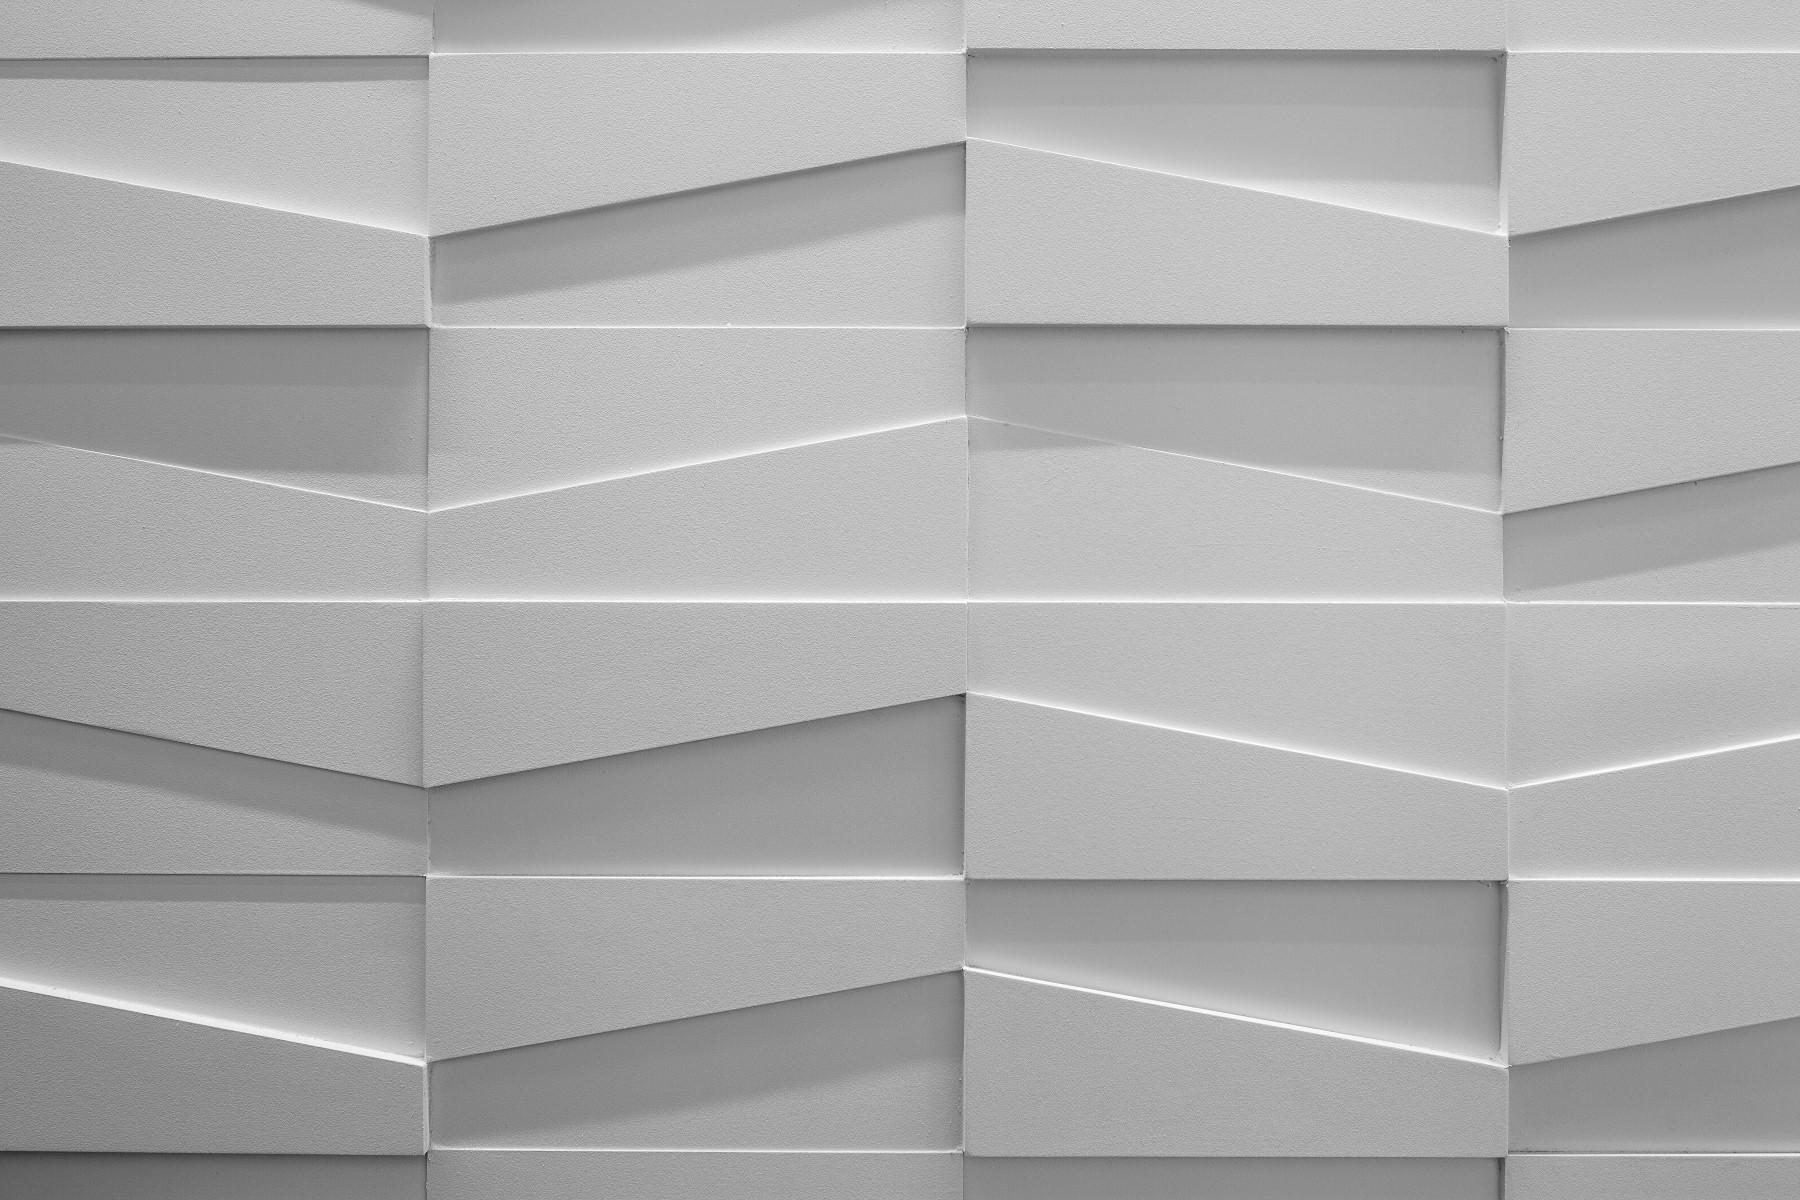 white17 Layers of White